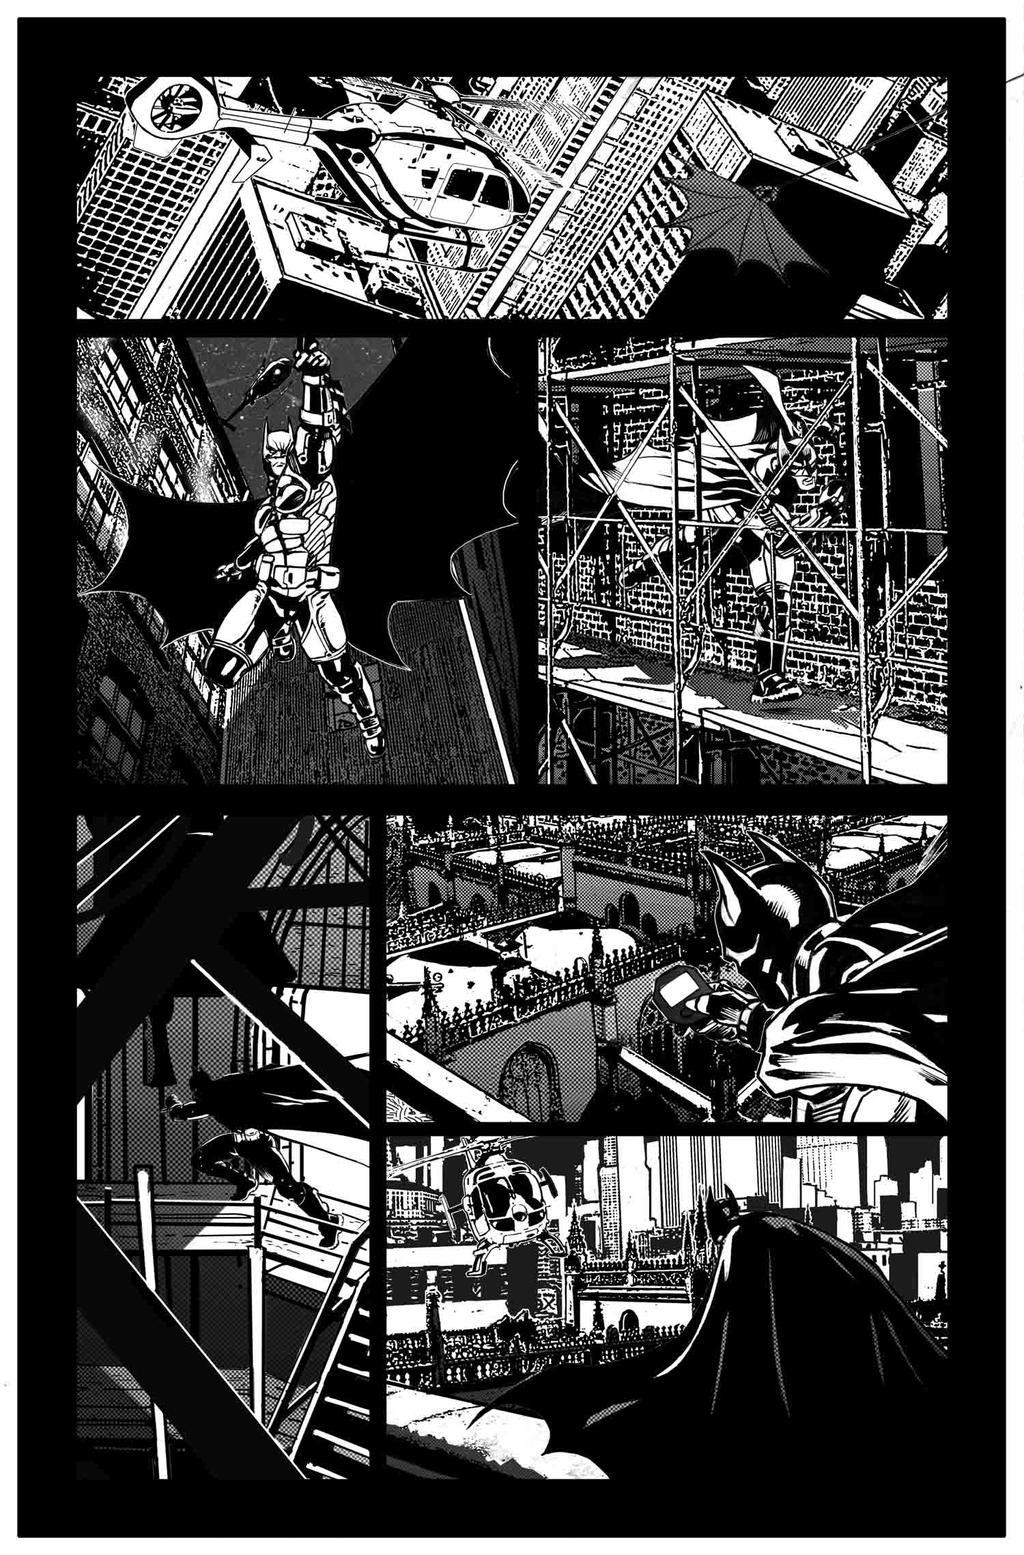 Batman: Arkham Origins Week 6 Page 106 by druje